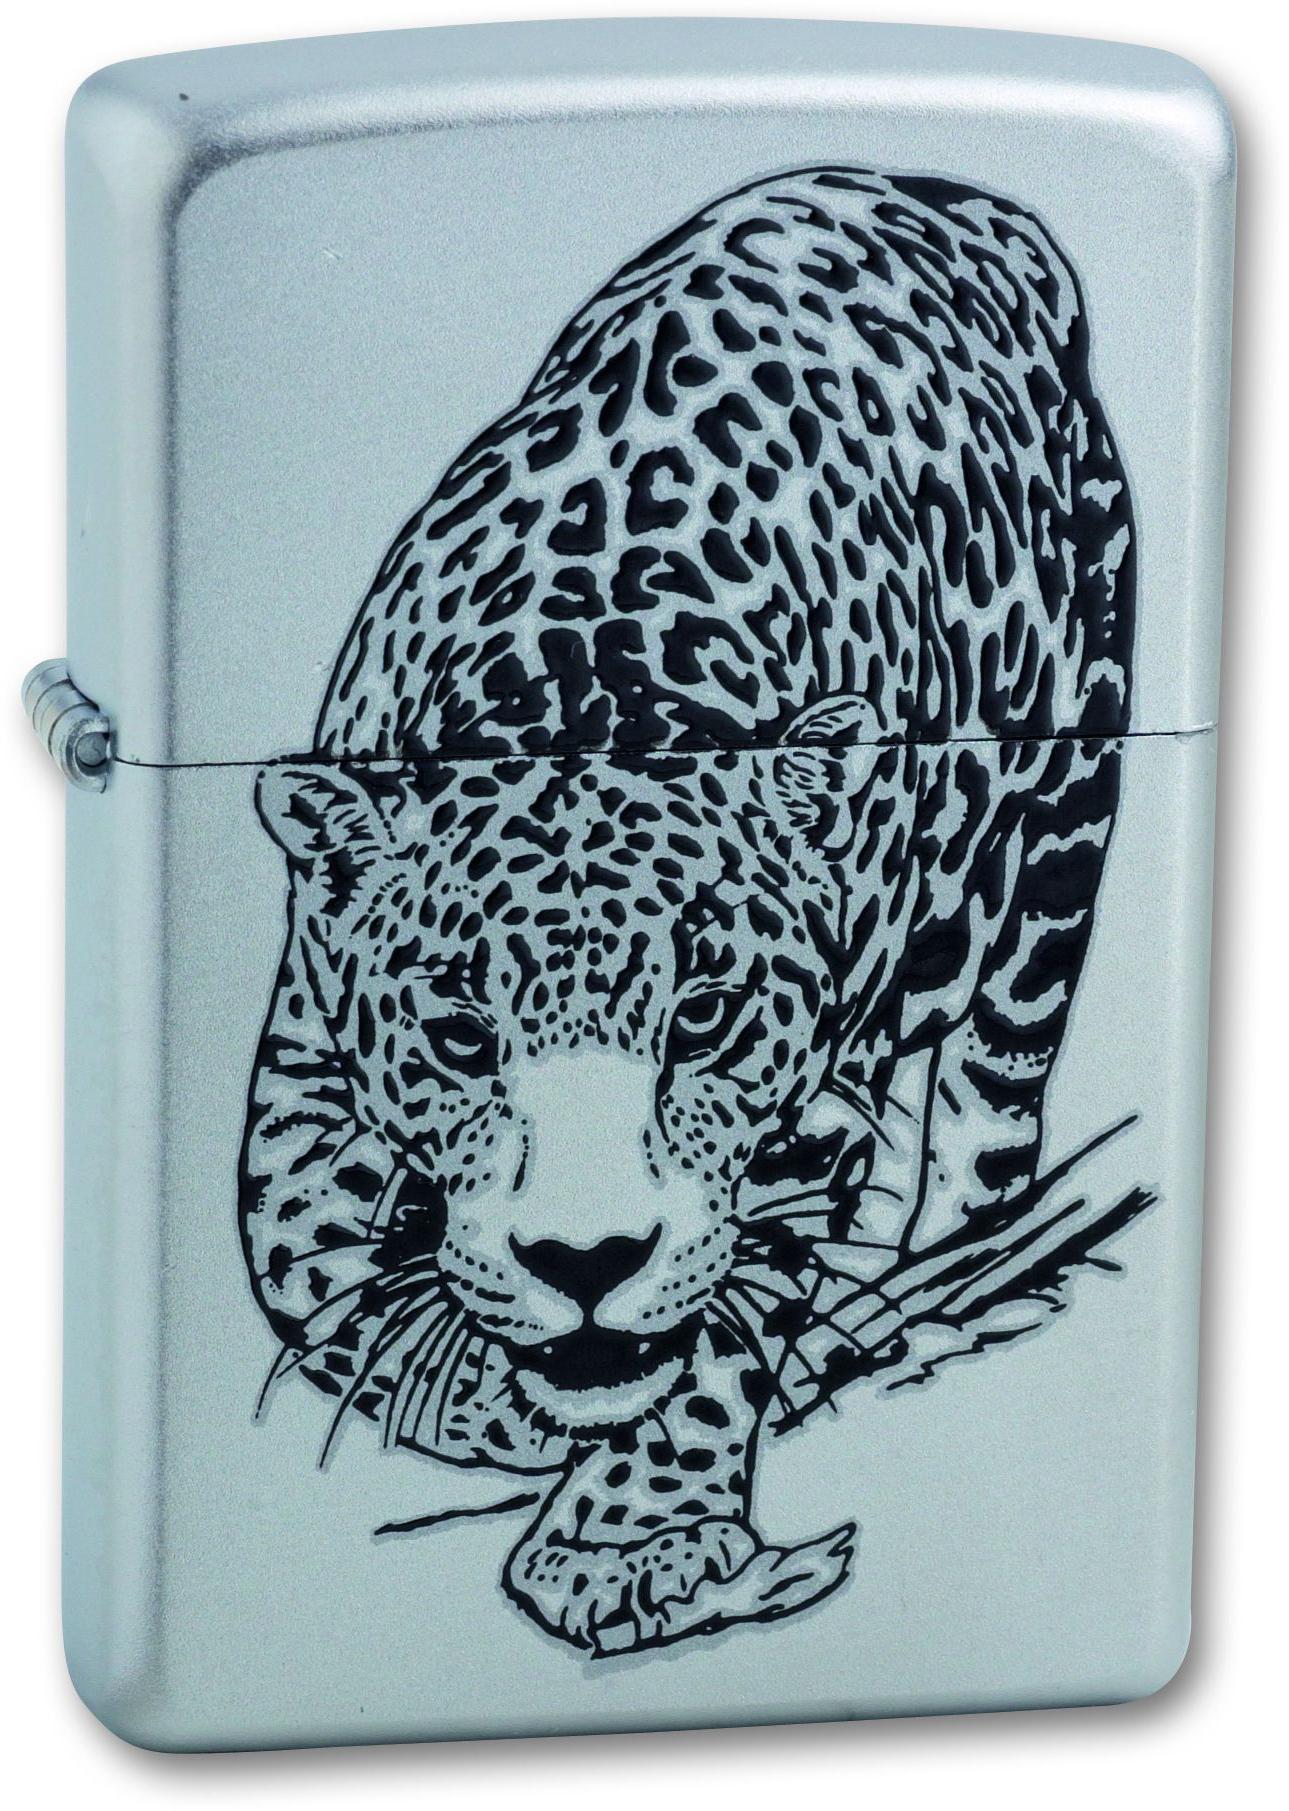 Зажигалка ZIPPO Leopard Satin Chrome, латунь с никеле-хромовым покрыт., серебр., матовая, 36х56х12ммЗажигалки Zippo<br>Зажигалка ZIPPO Leopard Satin Chrome, латунь с никеле-хромовым покрытием, серебряный, матовая, 36х56х12 мм<br>